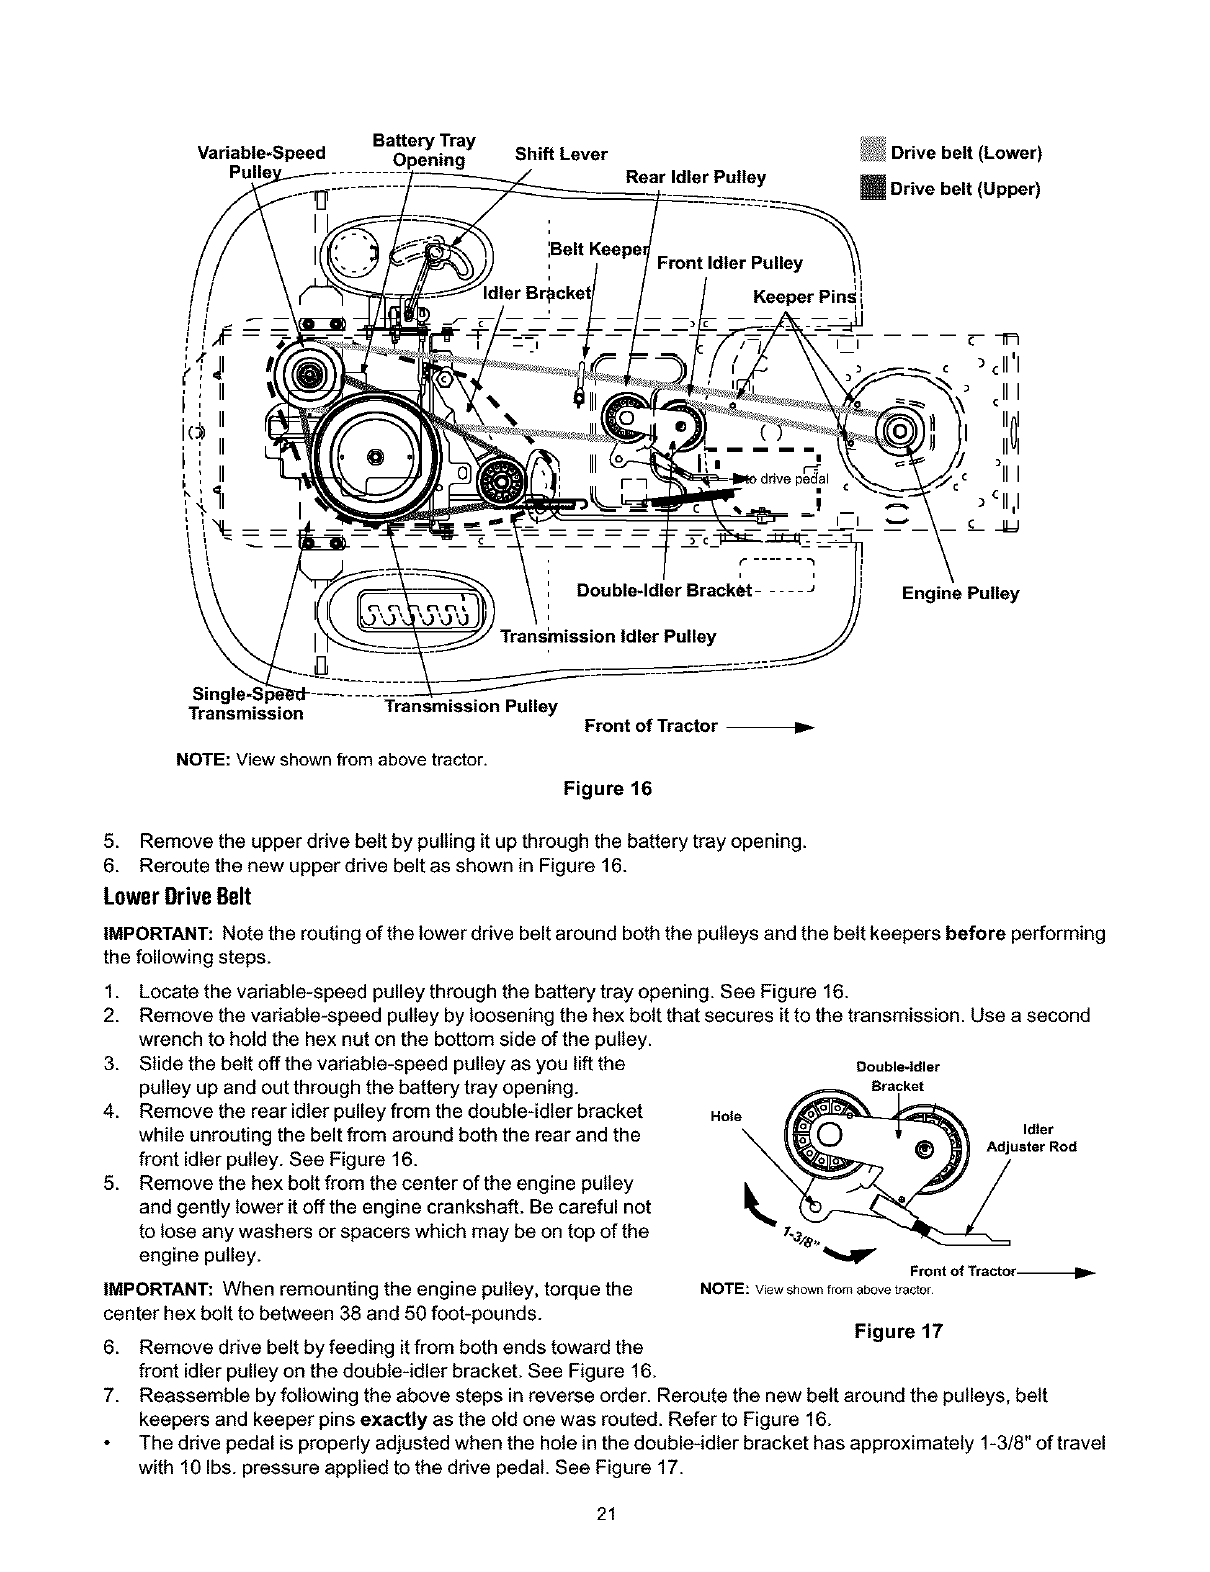 [DIAGRAM_38IU]  Troybilt 13AJ609G766 User Manual LAWN TRACTOR Manuals And Guides L0403348 | Troybuit Electric Wire Diagram 13aj609g766 |  | UserManual.wiki